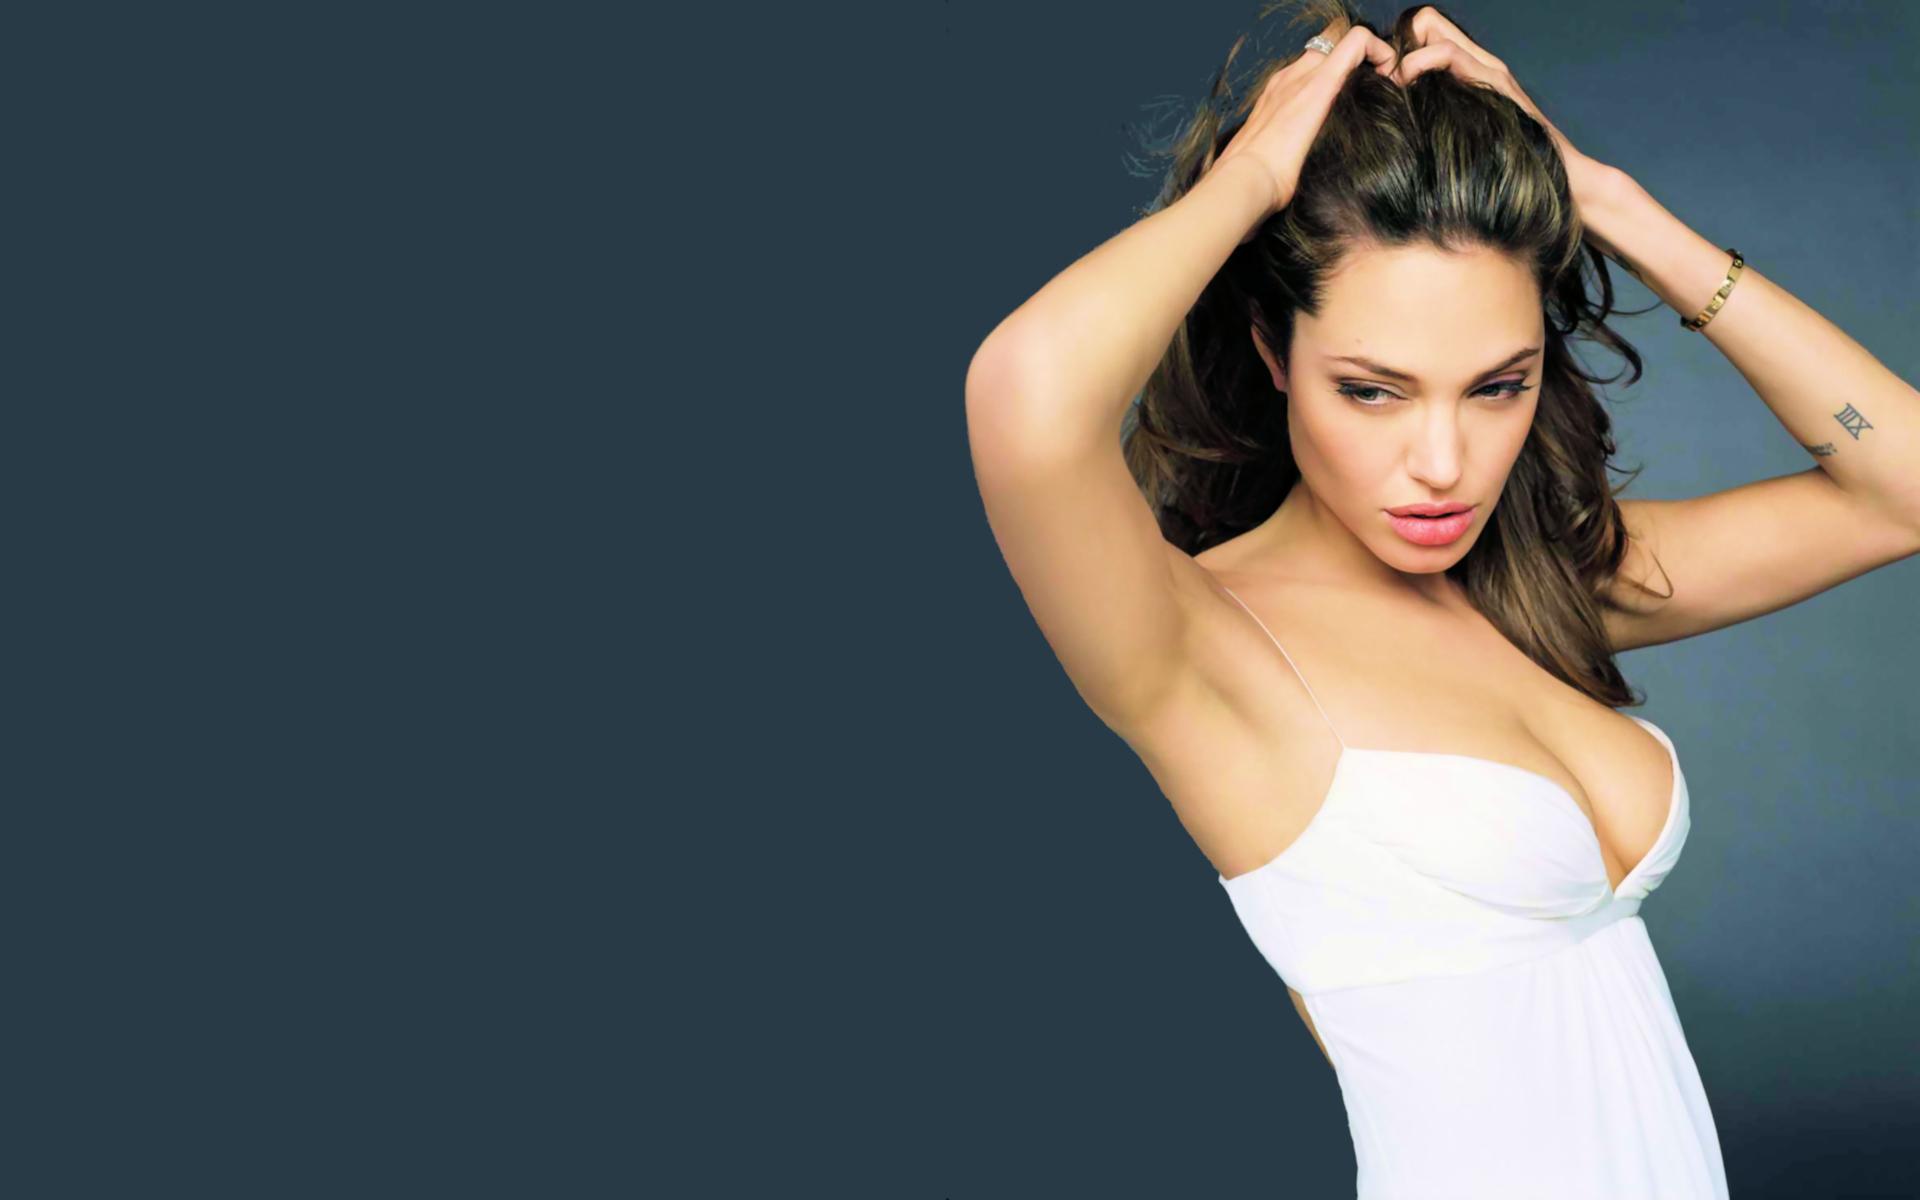 Bons Rapazes Angelina Jolie 40 anos 9